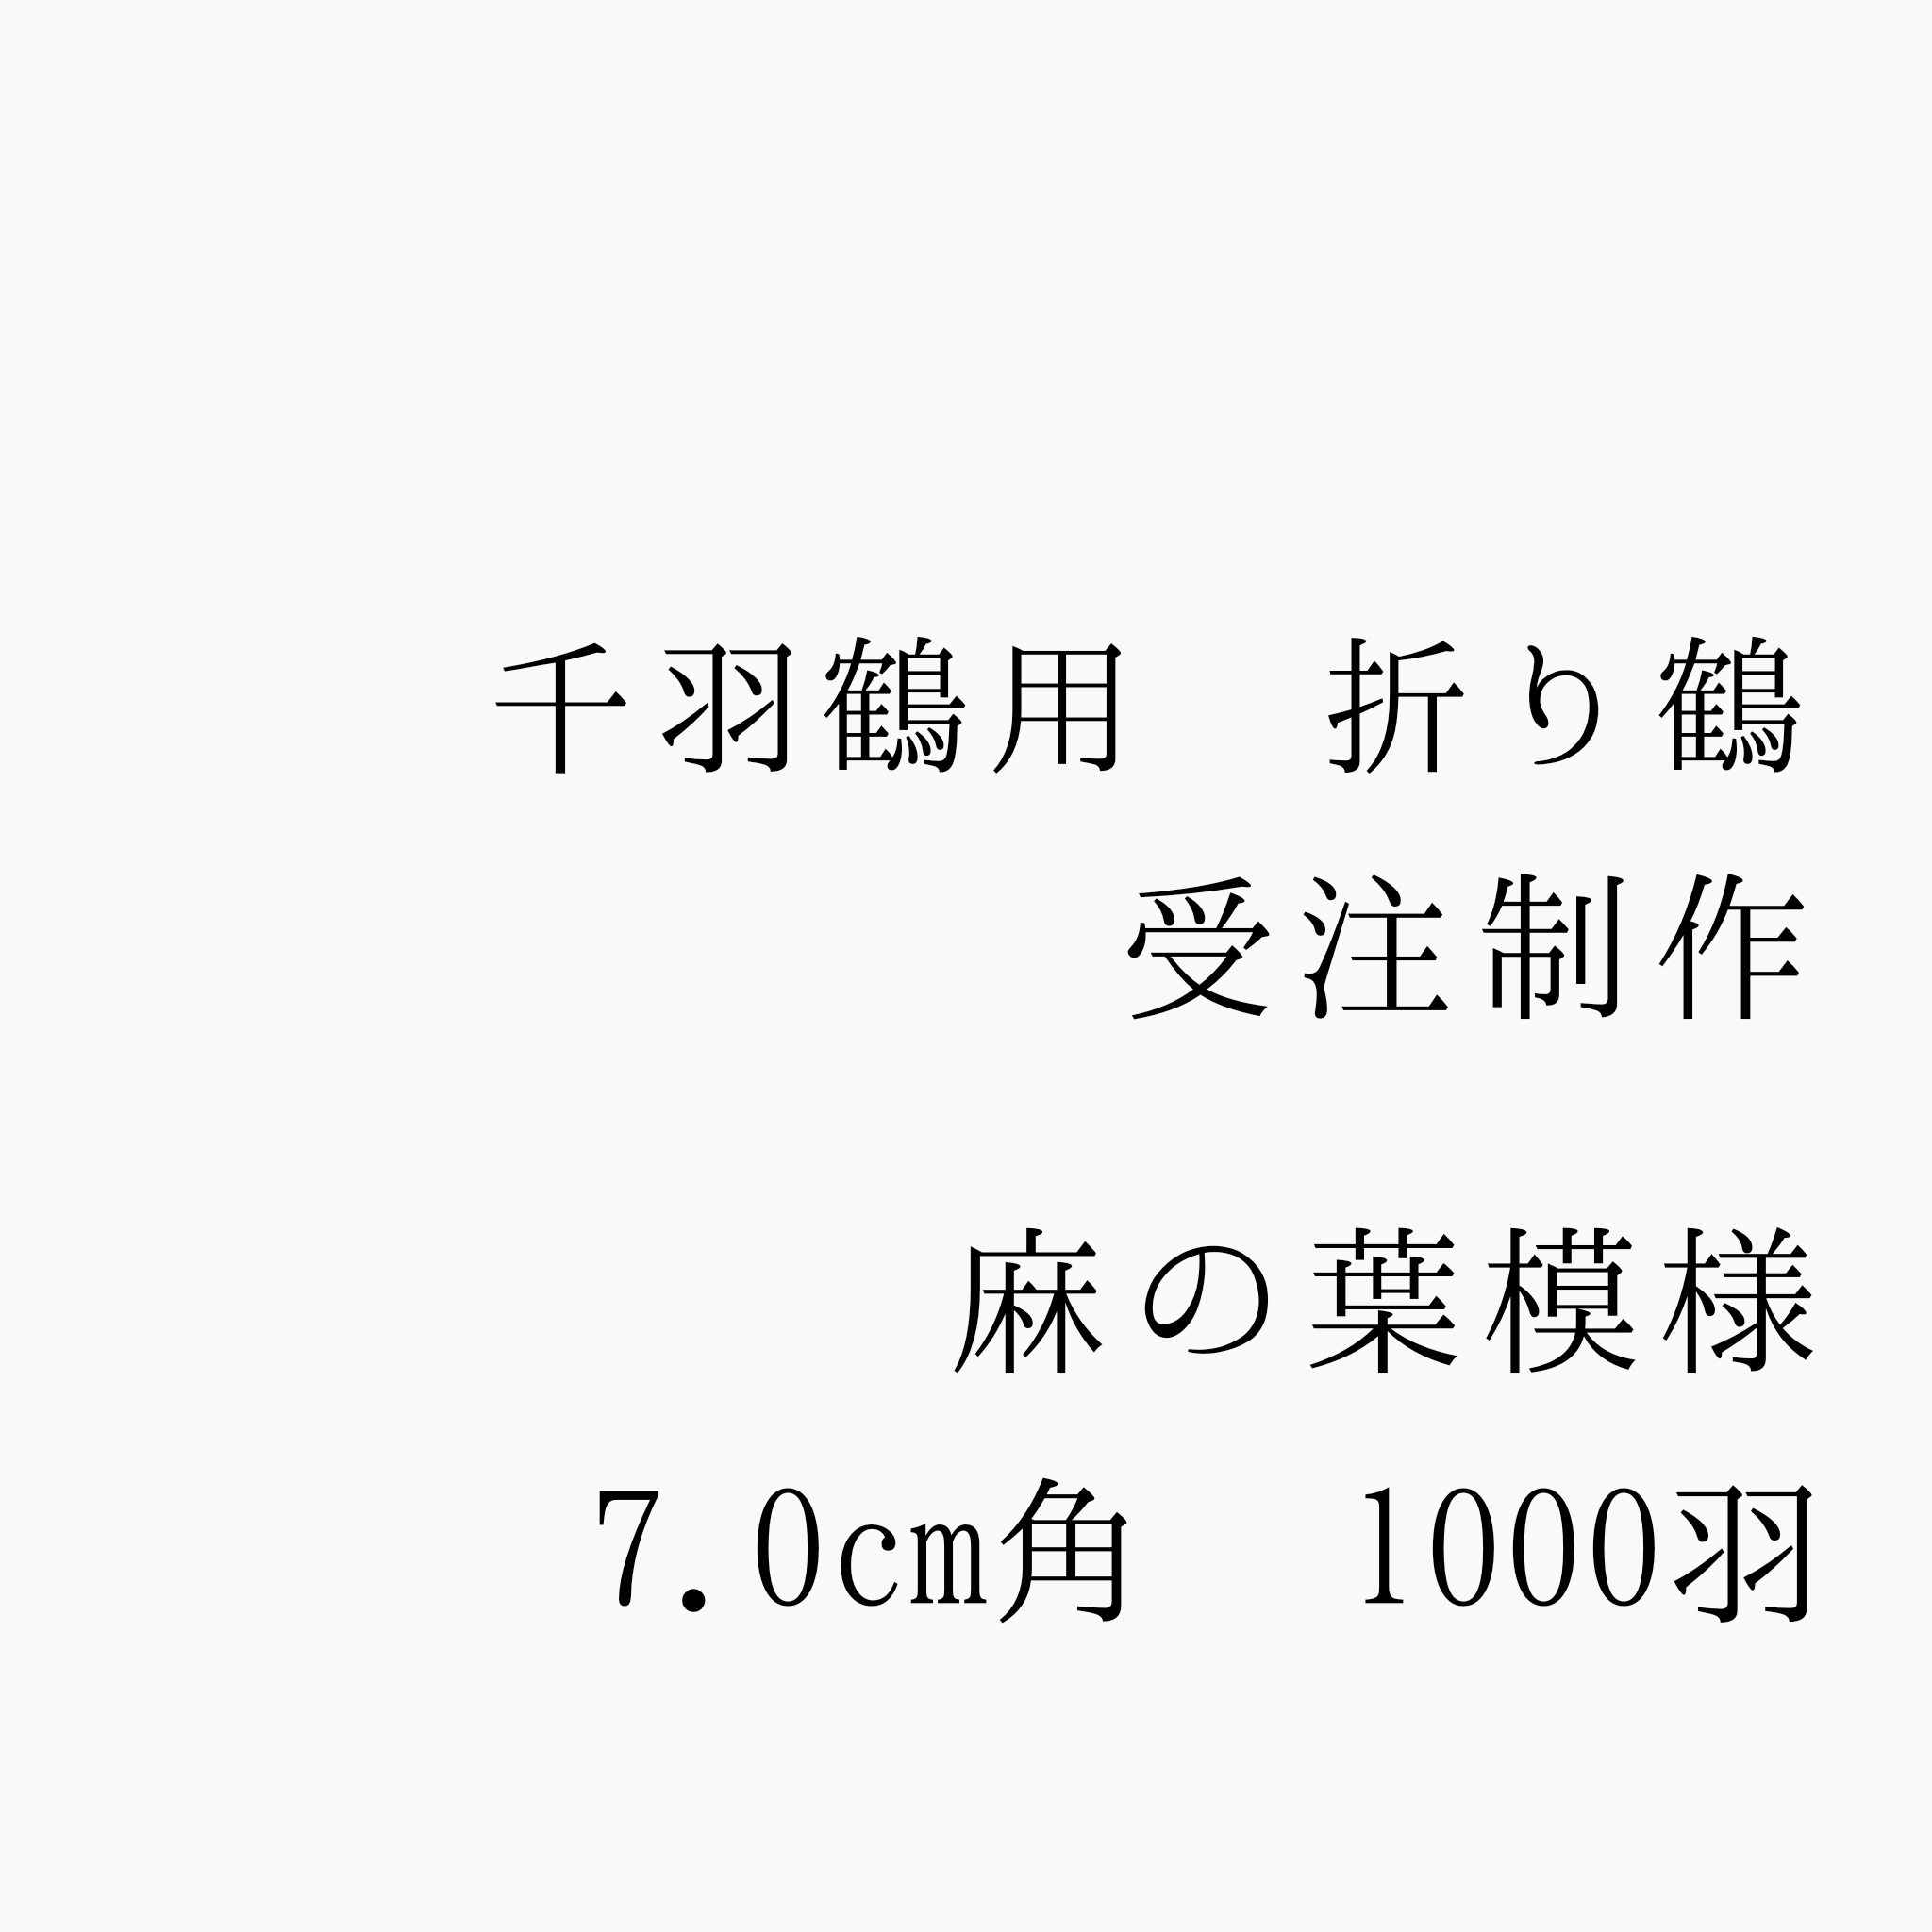 千羽鶴用折り鶴 受注制作 麻の葉模様 7cm角